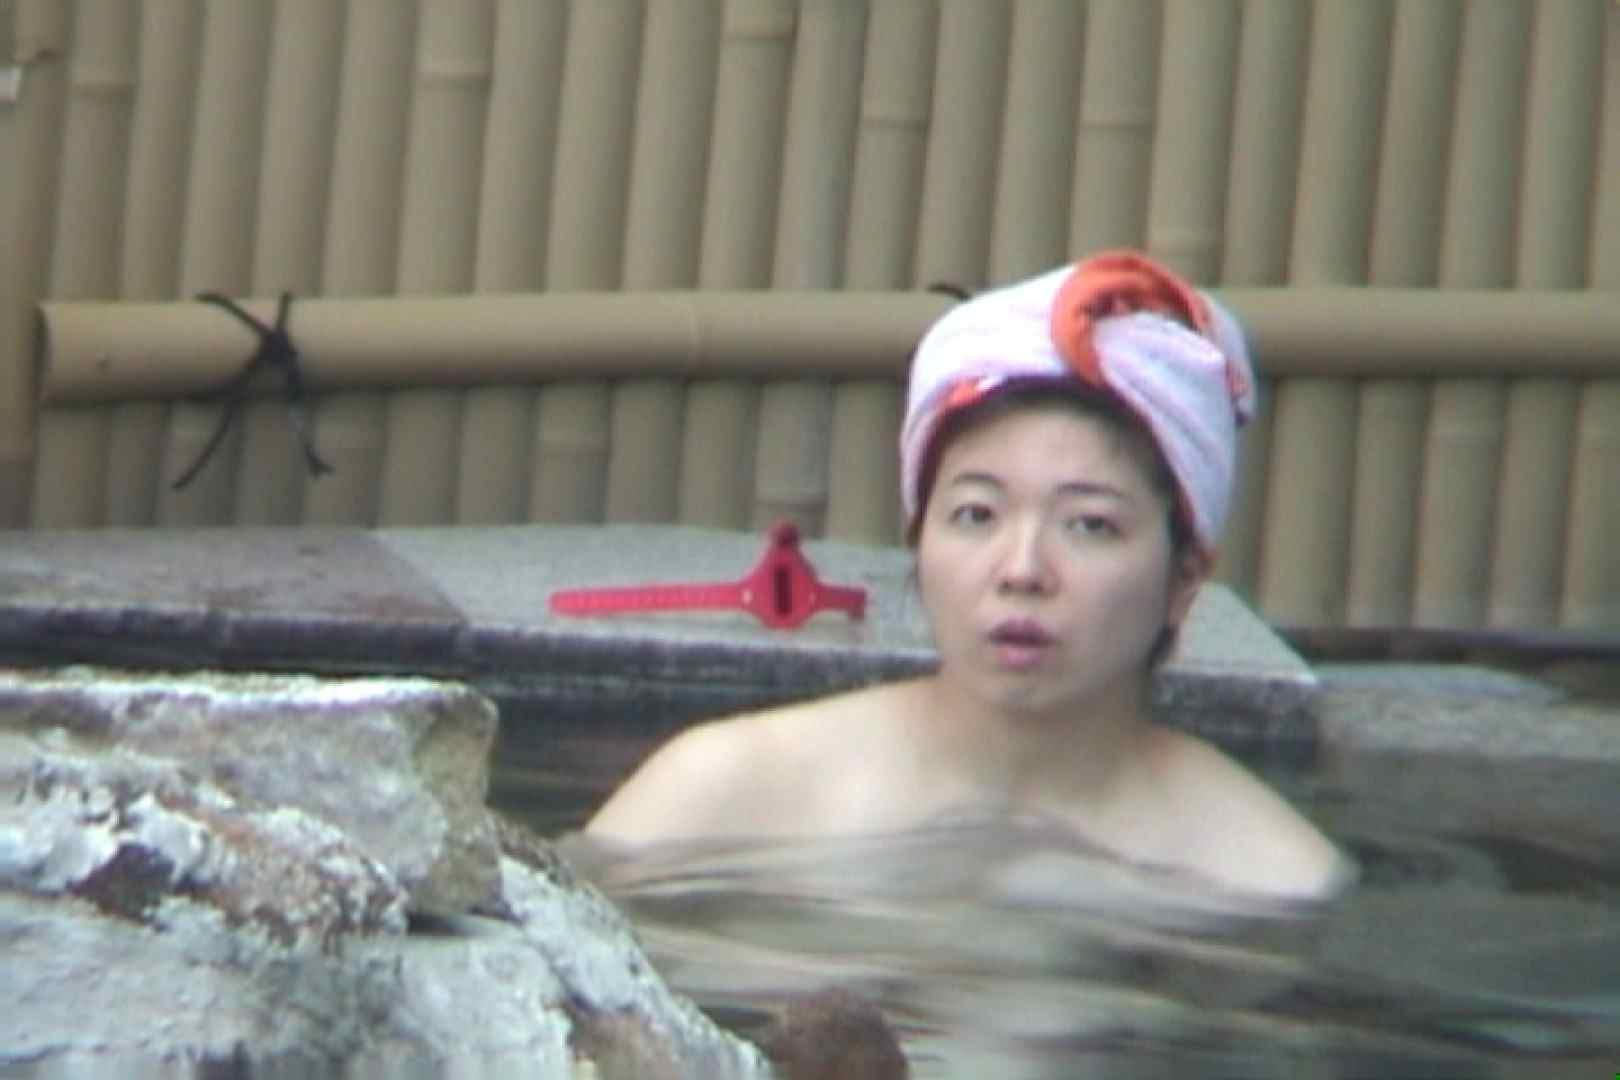 Aquaな露天風呂Vol.573 盗撮シリーズ | 露天風呂編  78PIX 1